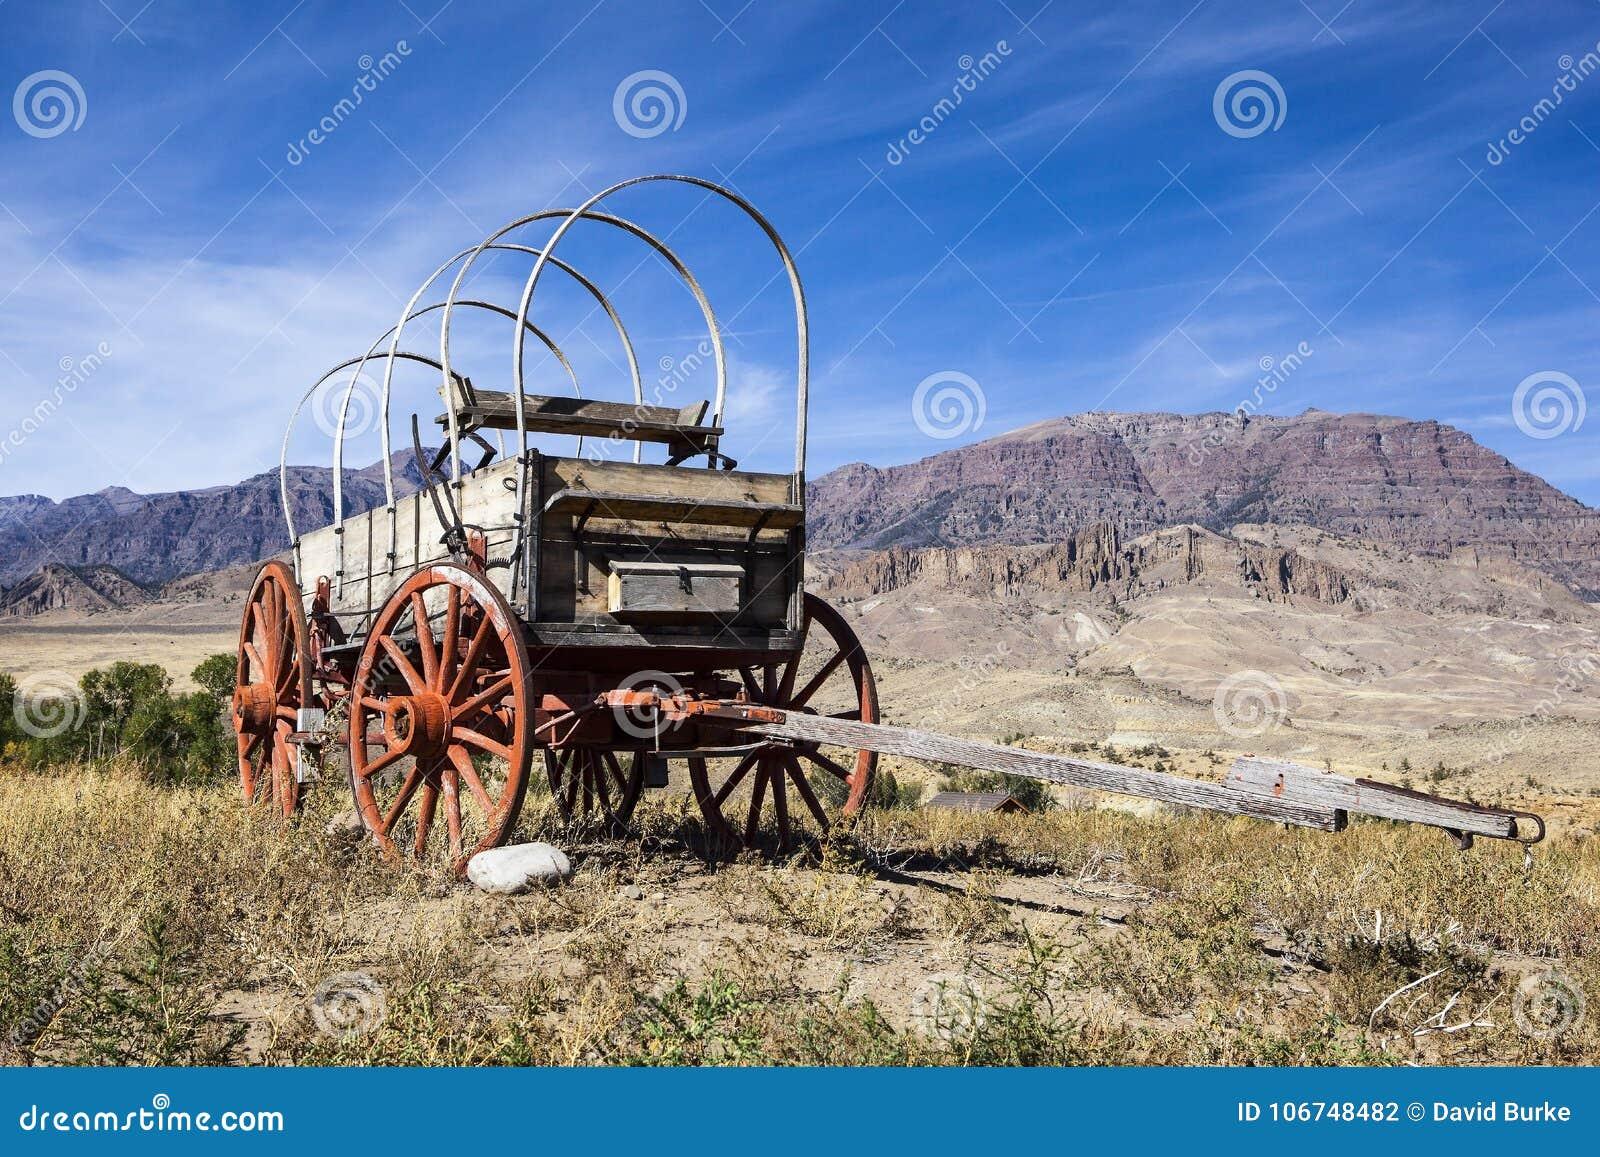 Western Covered Wood Wagon Mountains Stock Photo Image Of Badlands Landscape 106748482